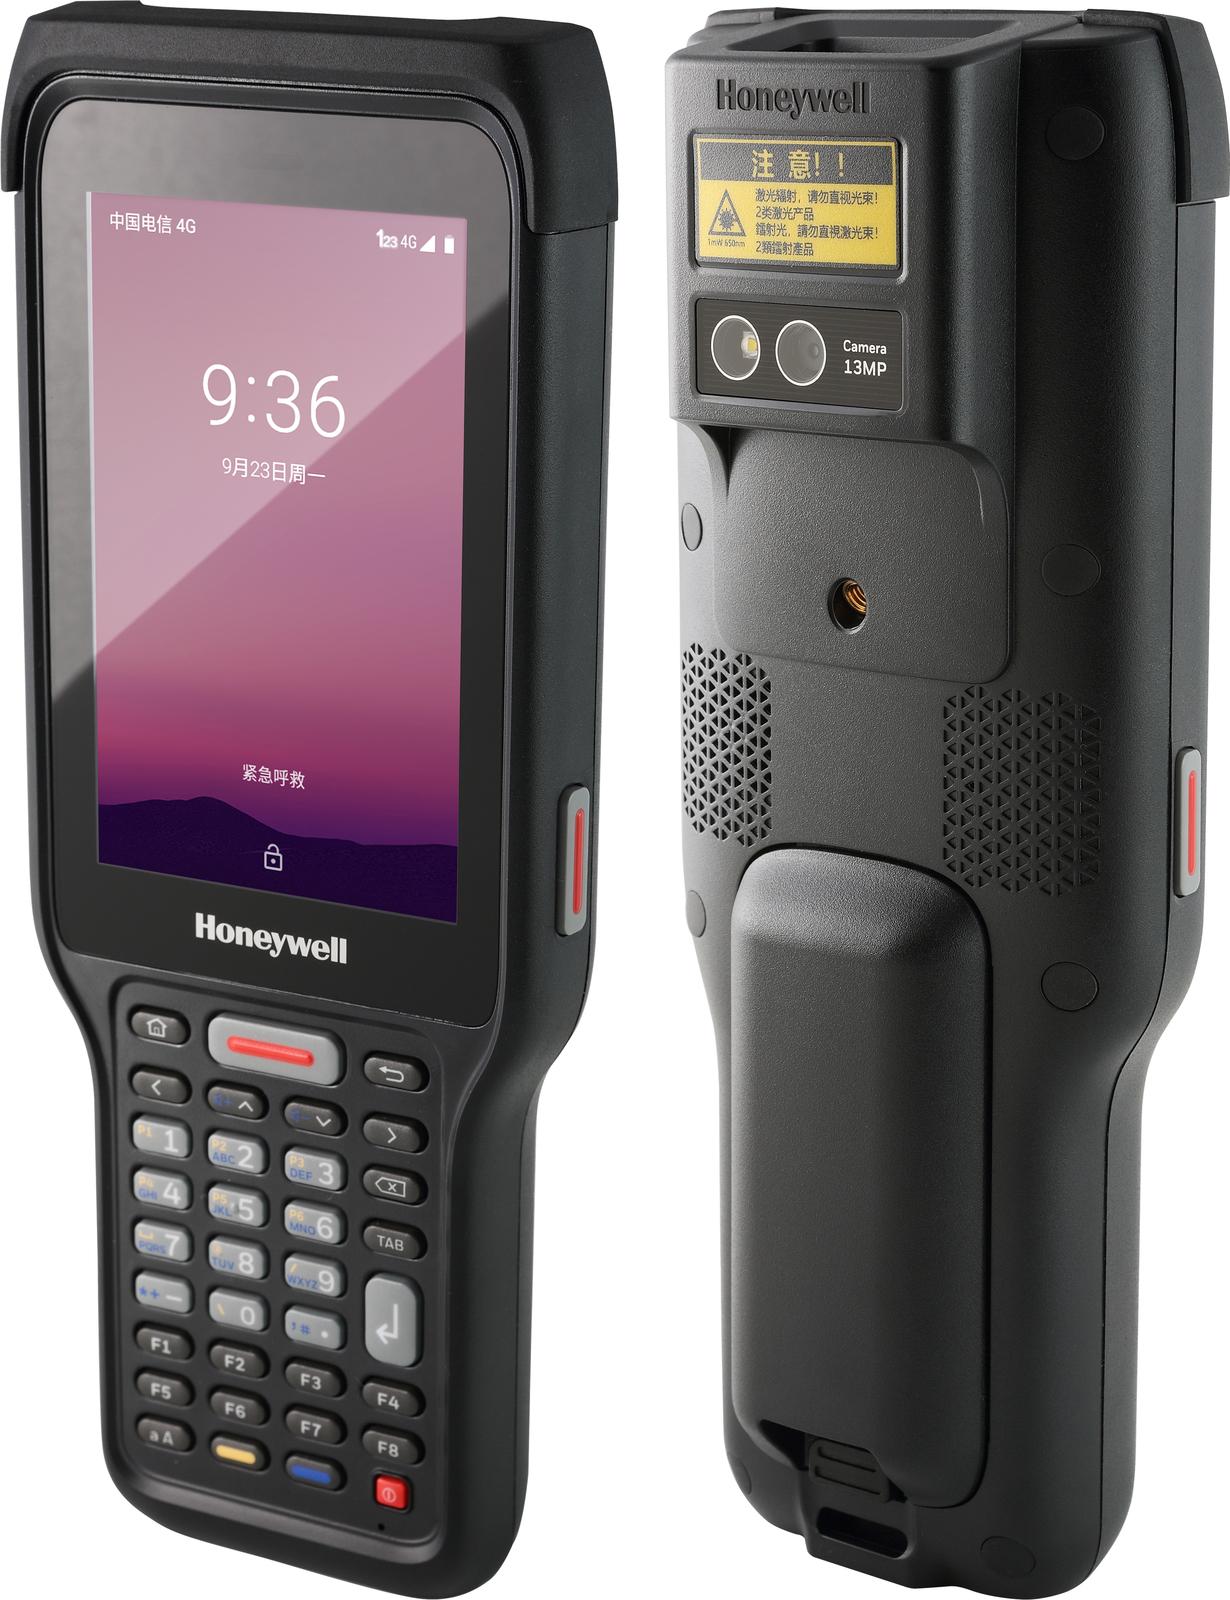 Honeywell EDA61K, Numeric Keypad, WLAN,  3G/32G, EX20 scan engine, 4  W125766207 - eet01